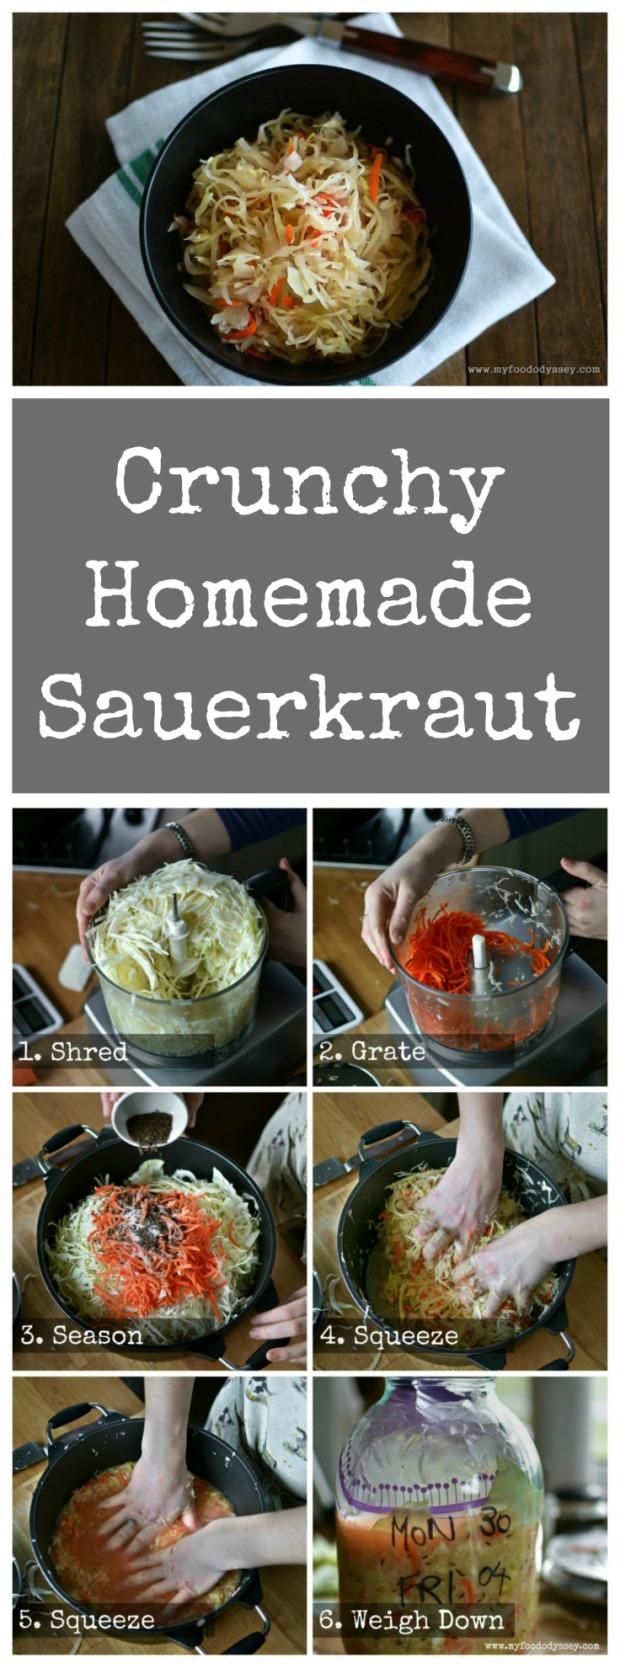 Lithuanian Sauerkraut (Rauginti Kopustai) | www.myfoododyssey.com